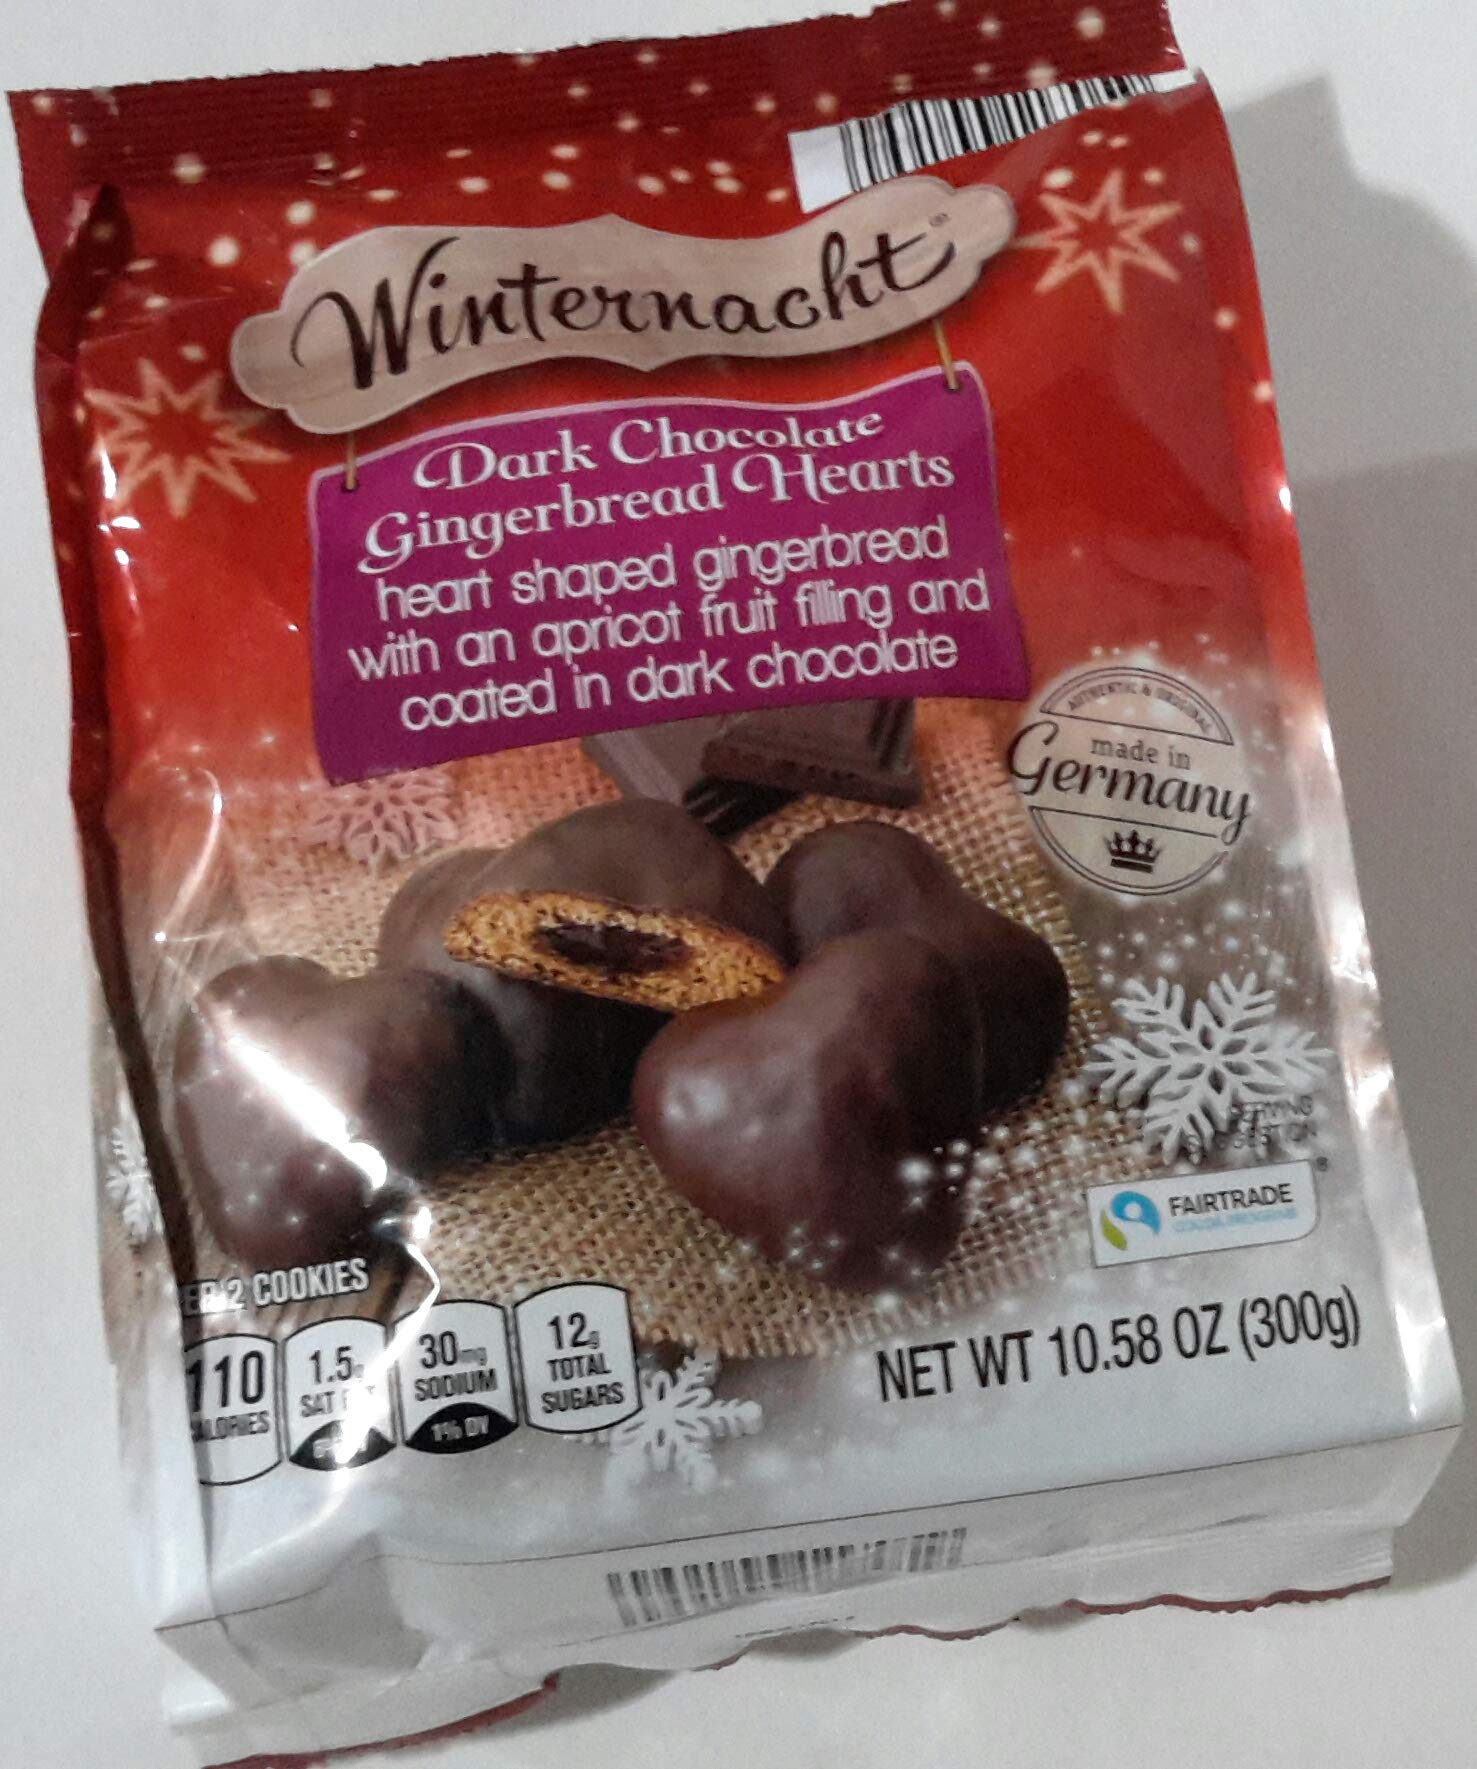 Winternacht Gefullte Herzen Zartbitter Traditional German Cookies Heart-shaped Soft Gingerbread Covered in Dark Chocolate with Apricot Fruit Filling